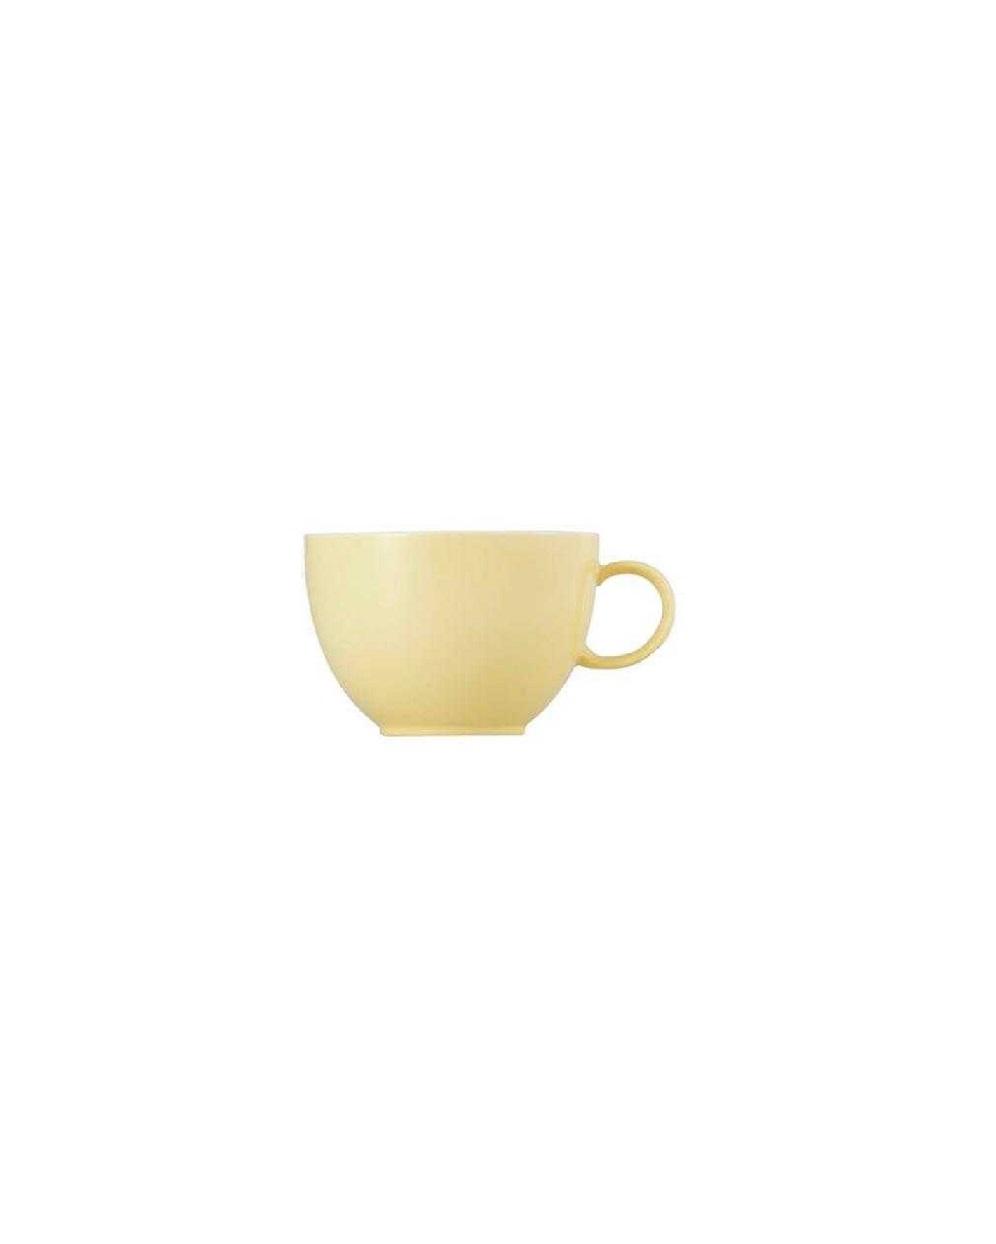 Чашка фарфоровая Rosenthal SUNNY DAY, объем 0,2 л, желтый Rosenthal 70850-408511-14642 фото 1